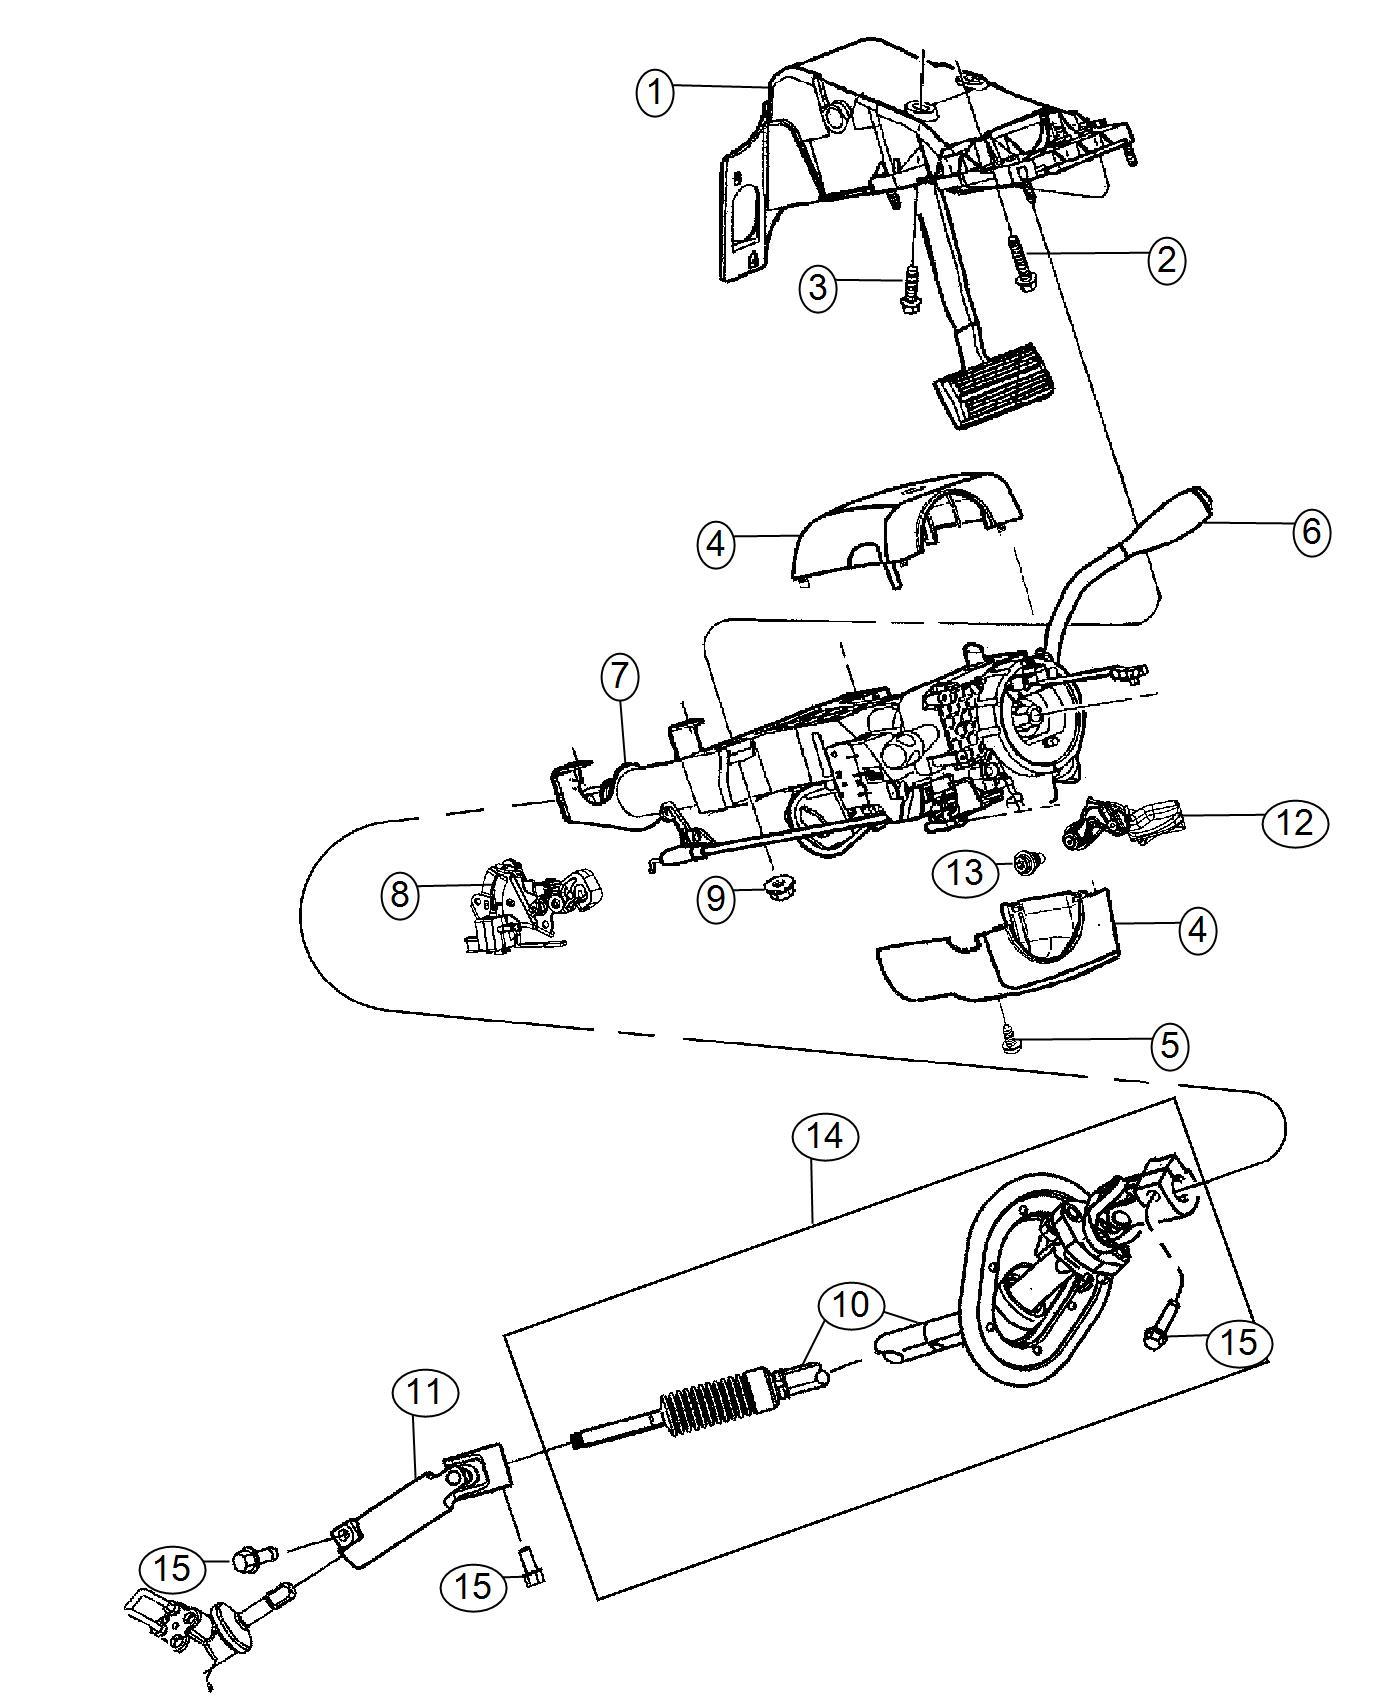 Ram Shaft Lower Steering Column Intermediate Suspension Mopar Assembly